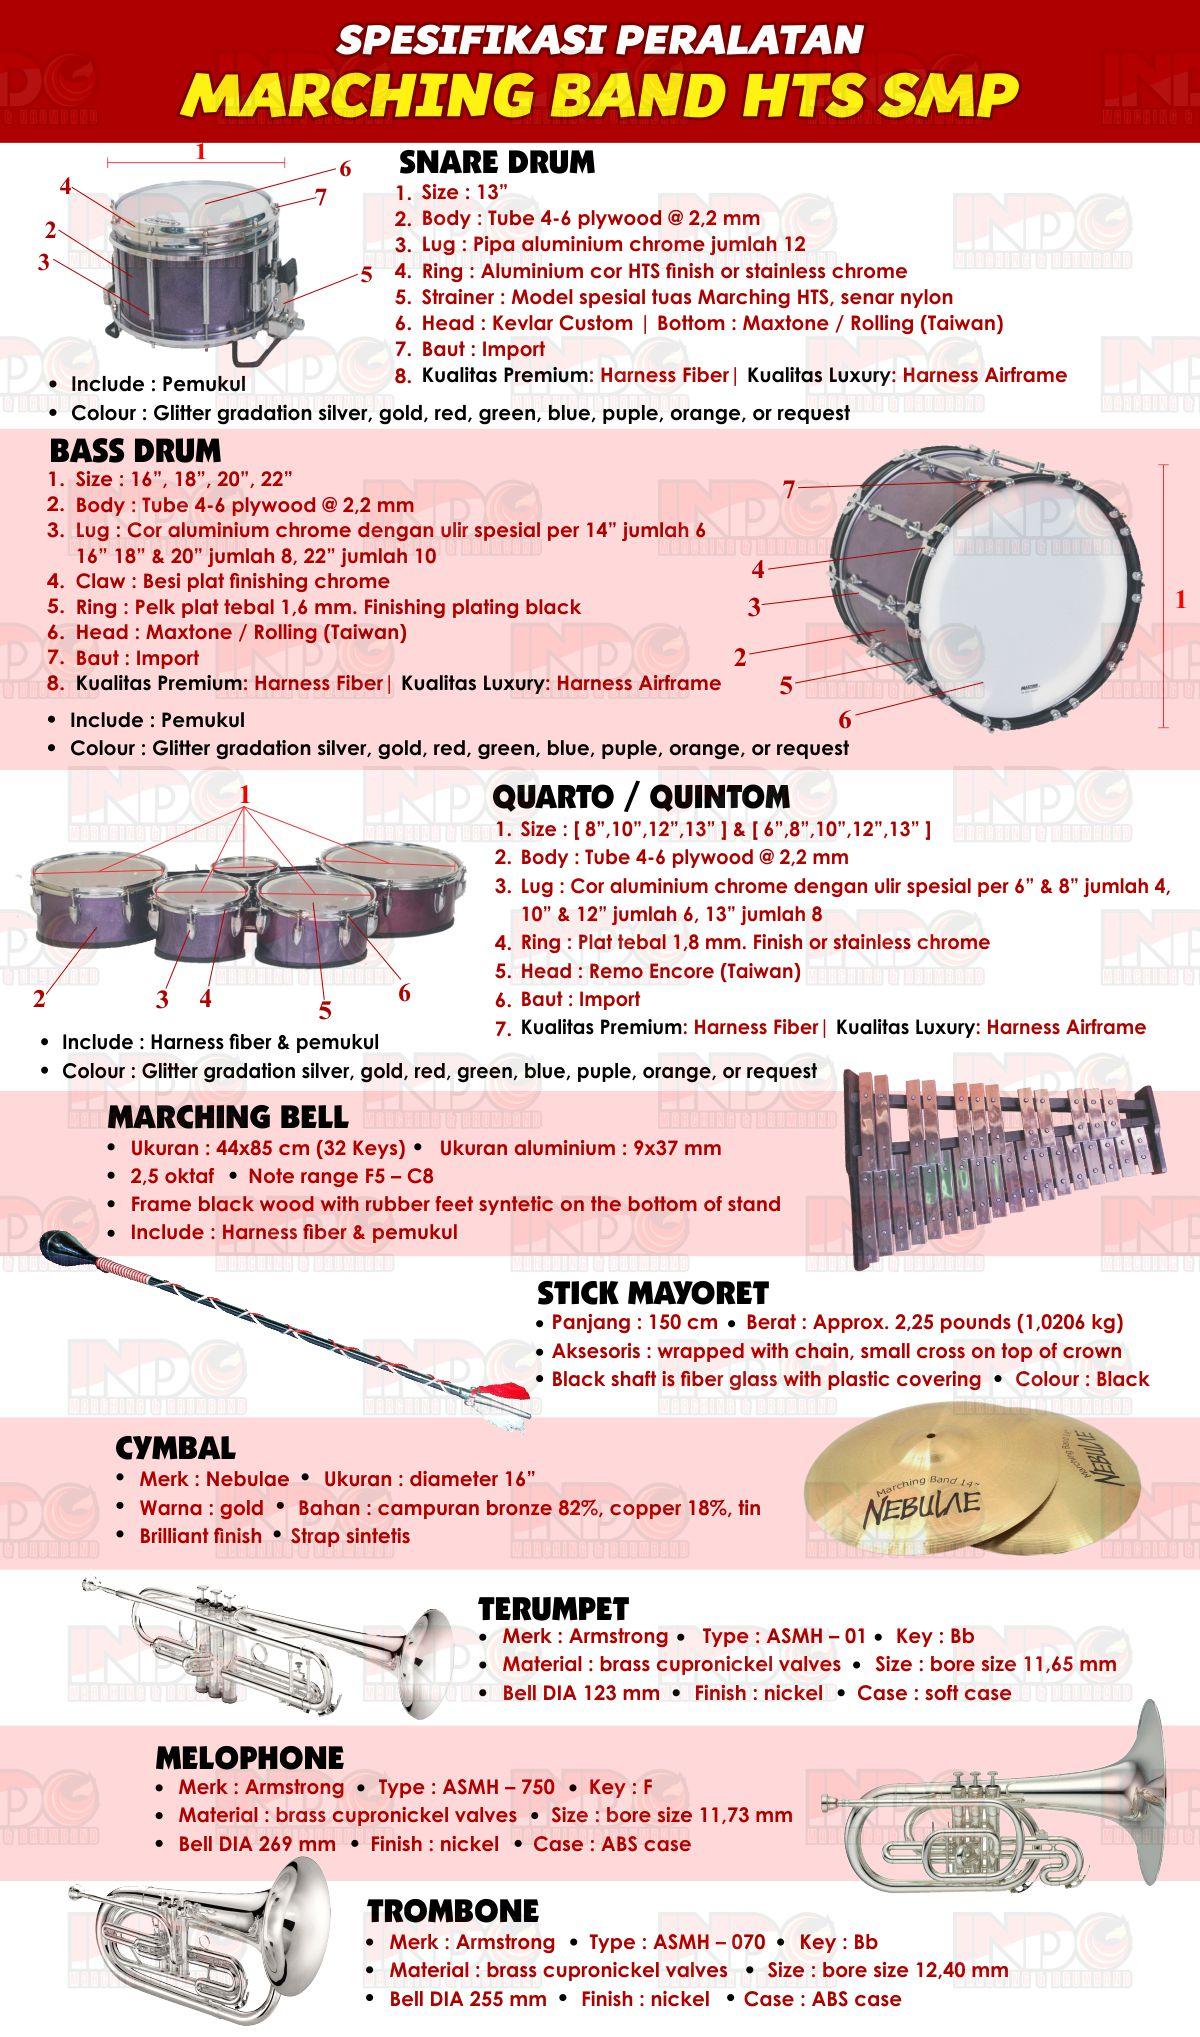 Spesifikasi Marching Band HTS SMP